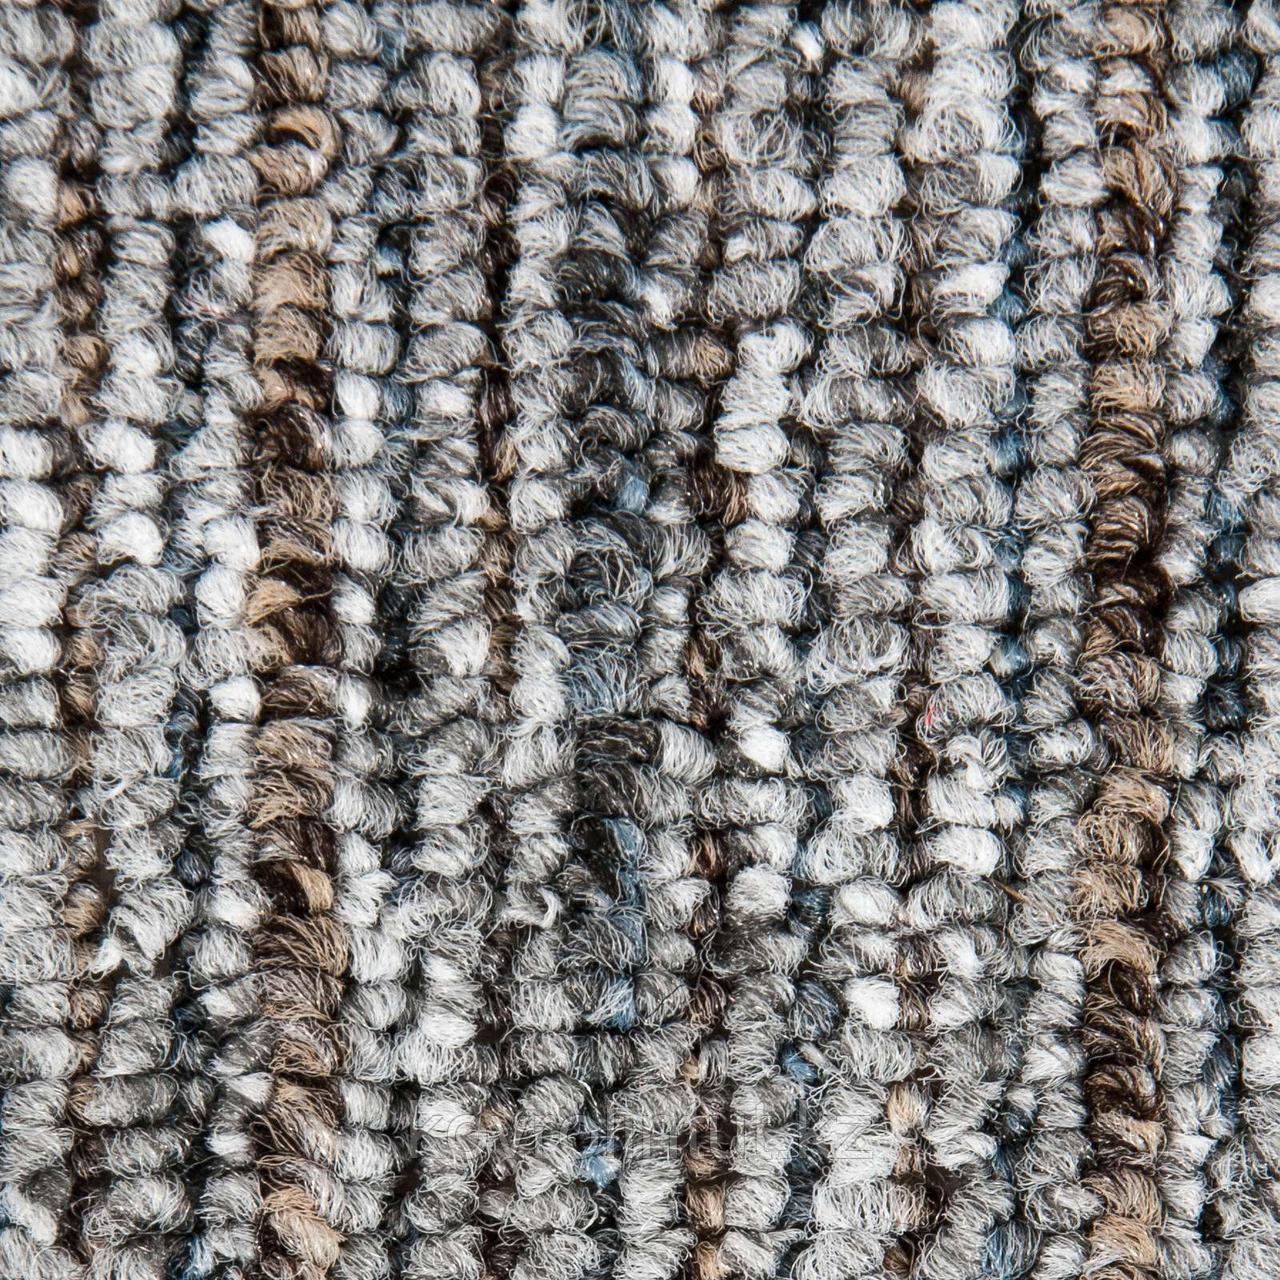 Покрытие ковровое King New 905, 4 м, 100% PP